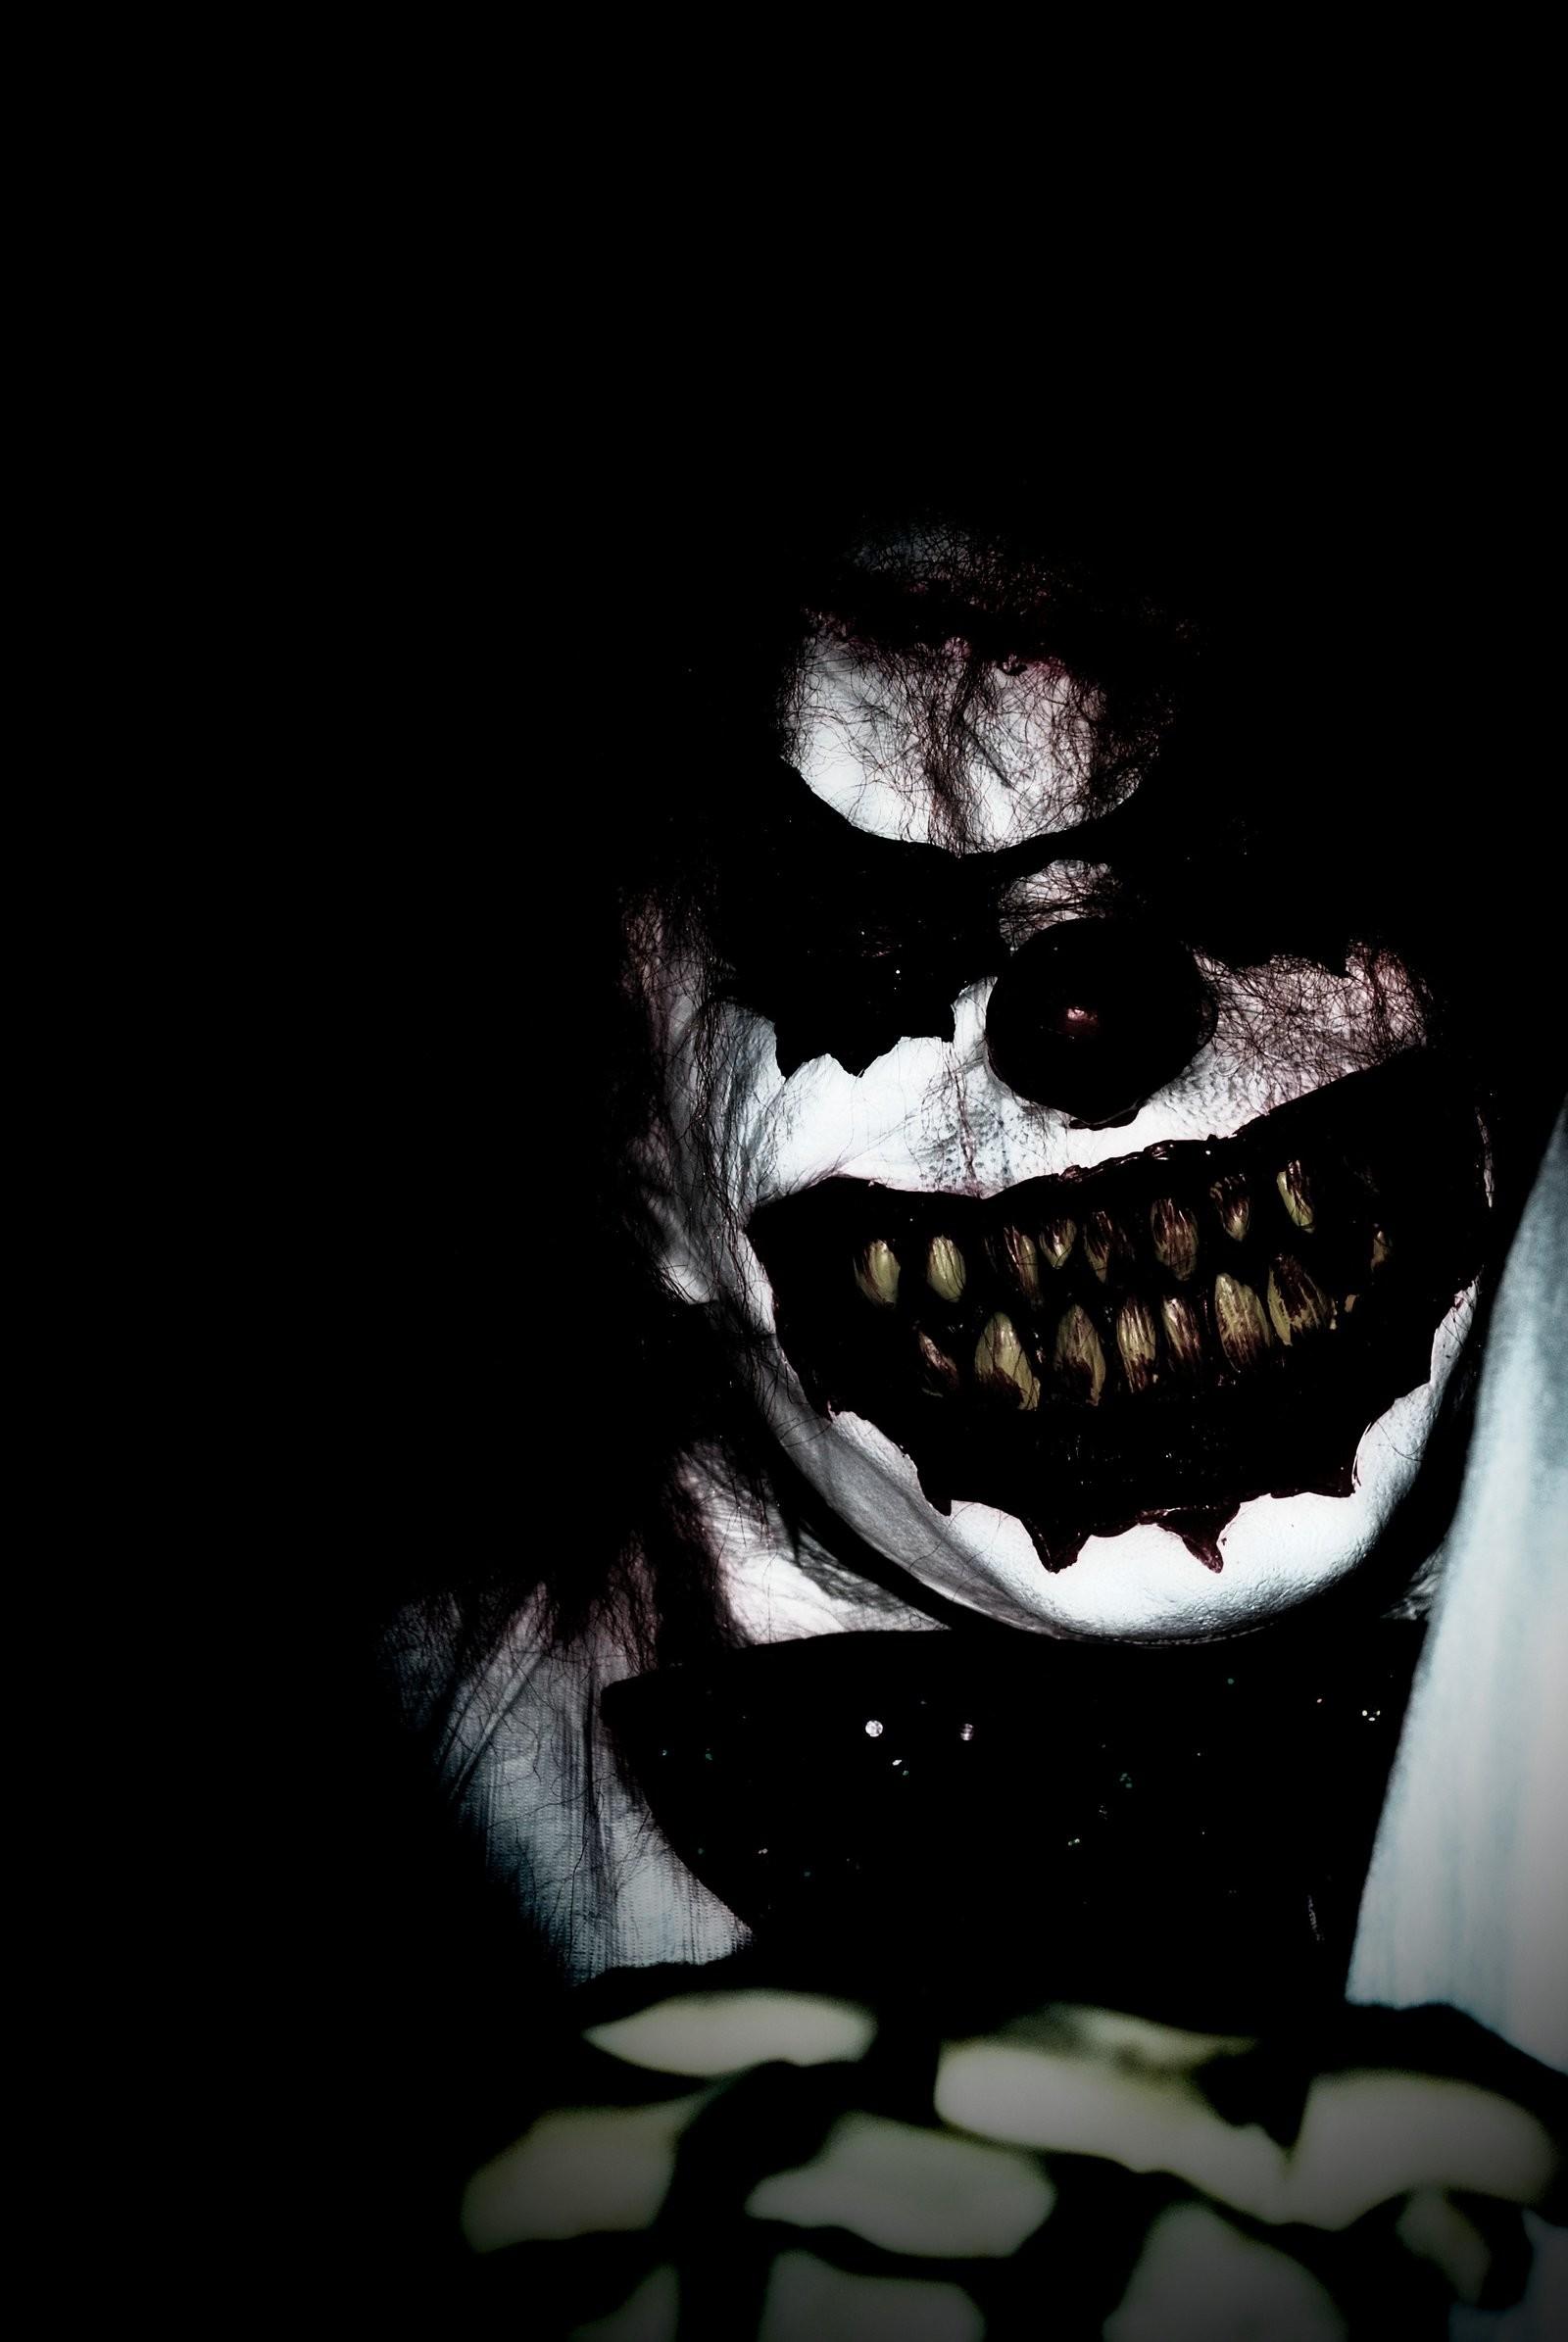 Evil clown wallpapers 66 pictures - Circus joker wallpaper ...